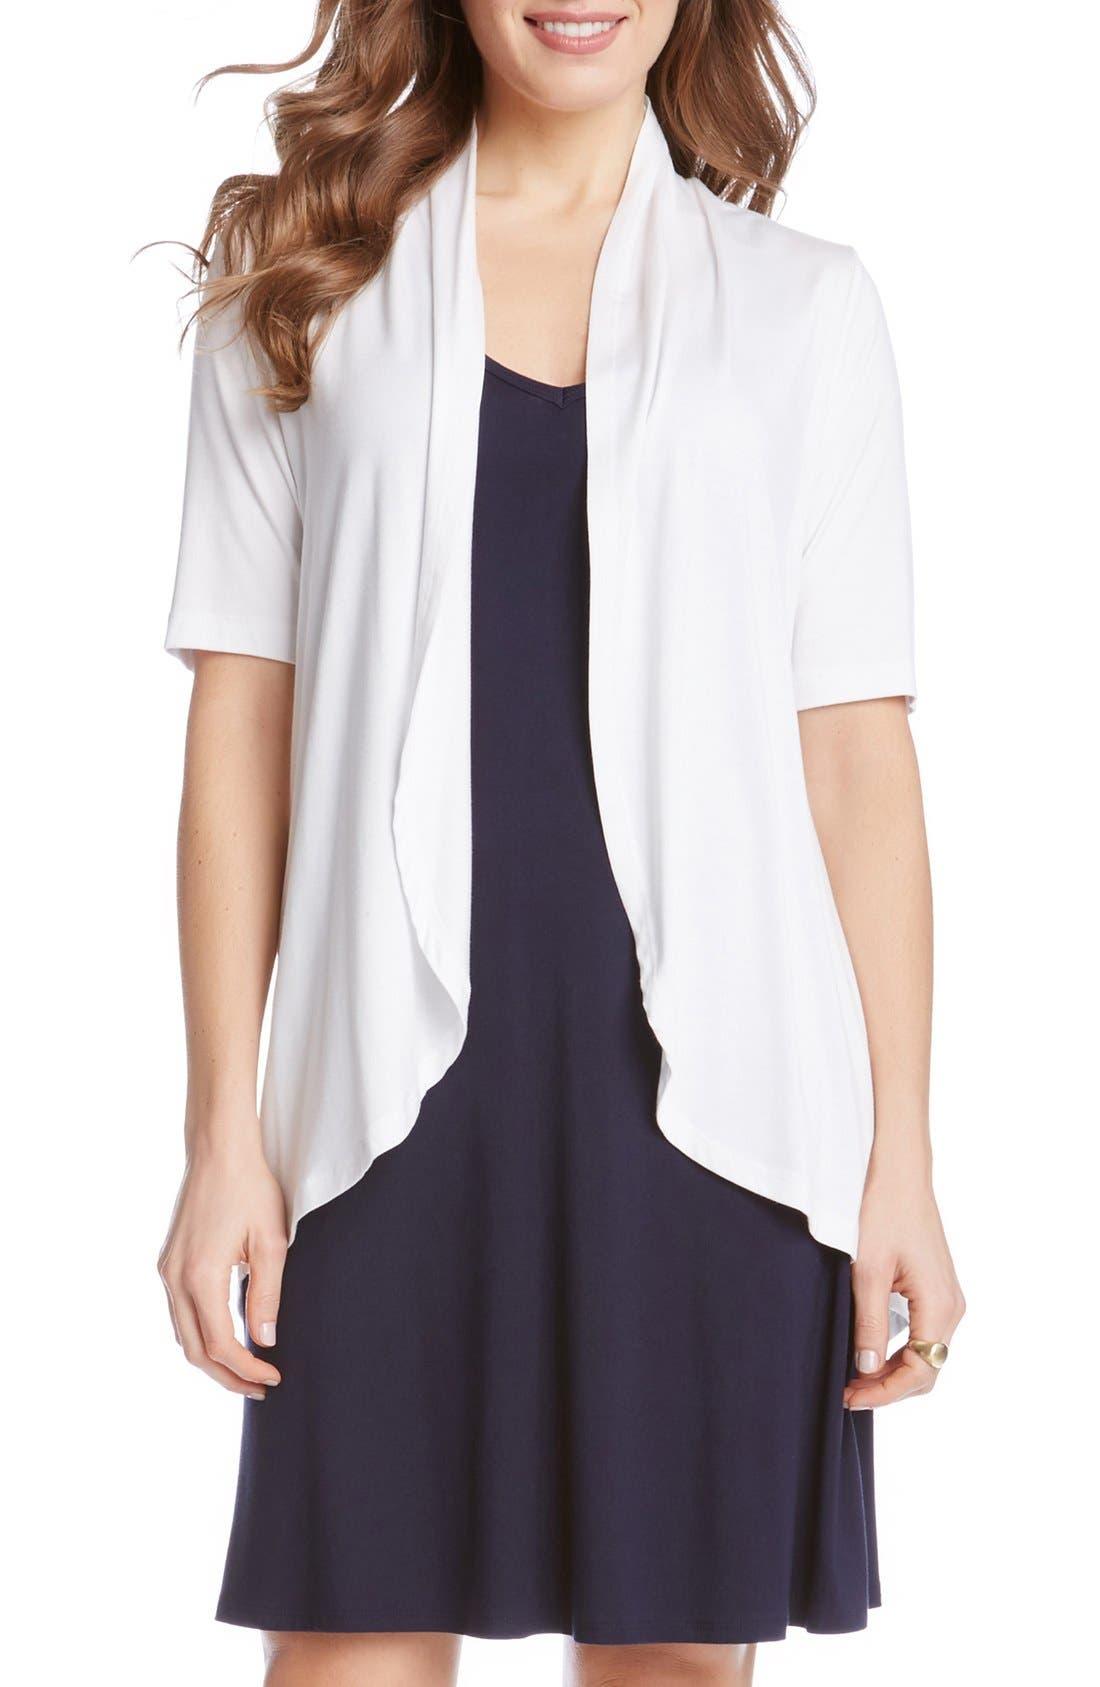 KAREN KANE 'Sophie' Short Sleeve Jersey Open Front